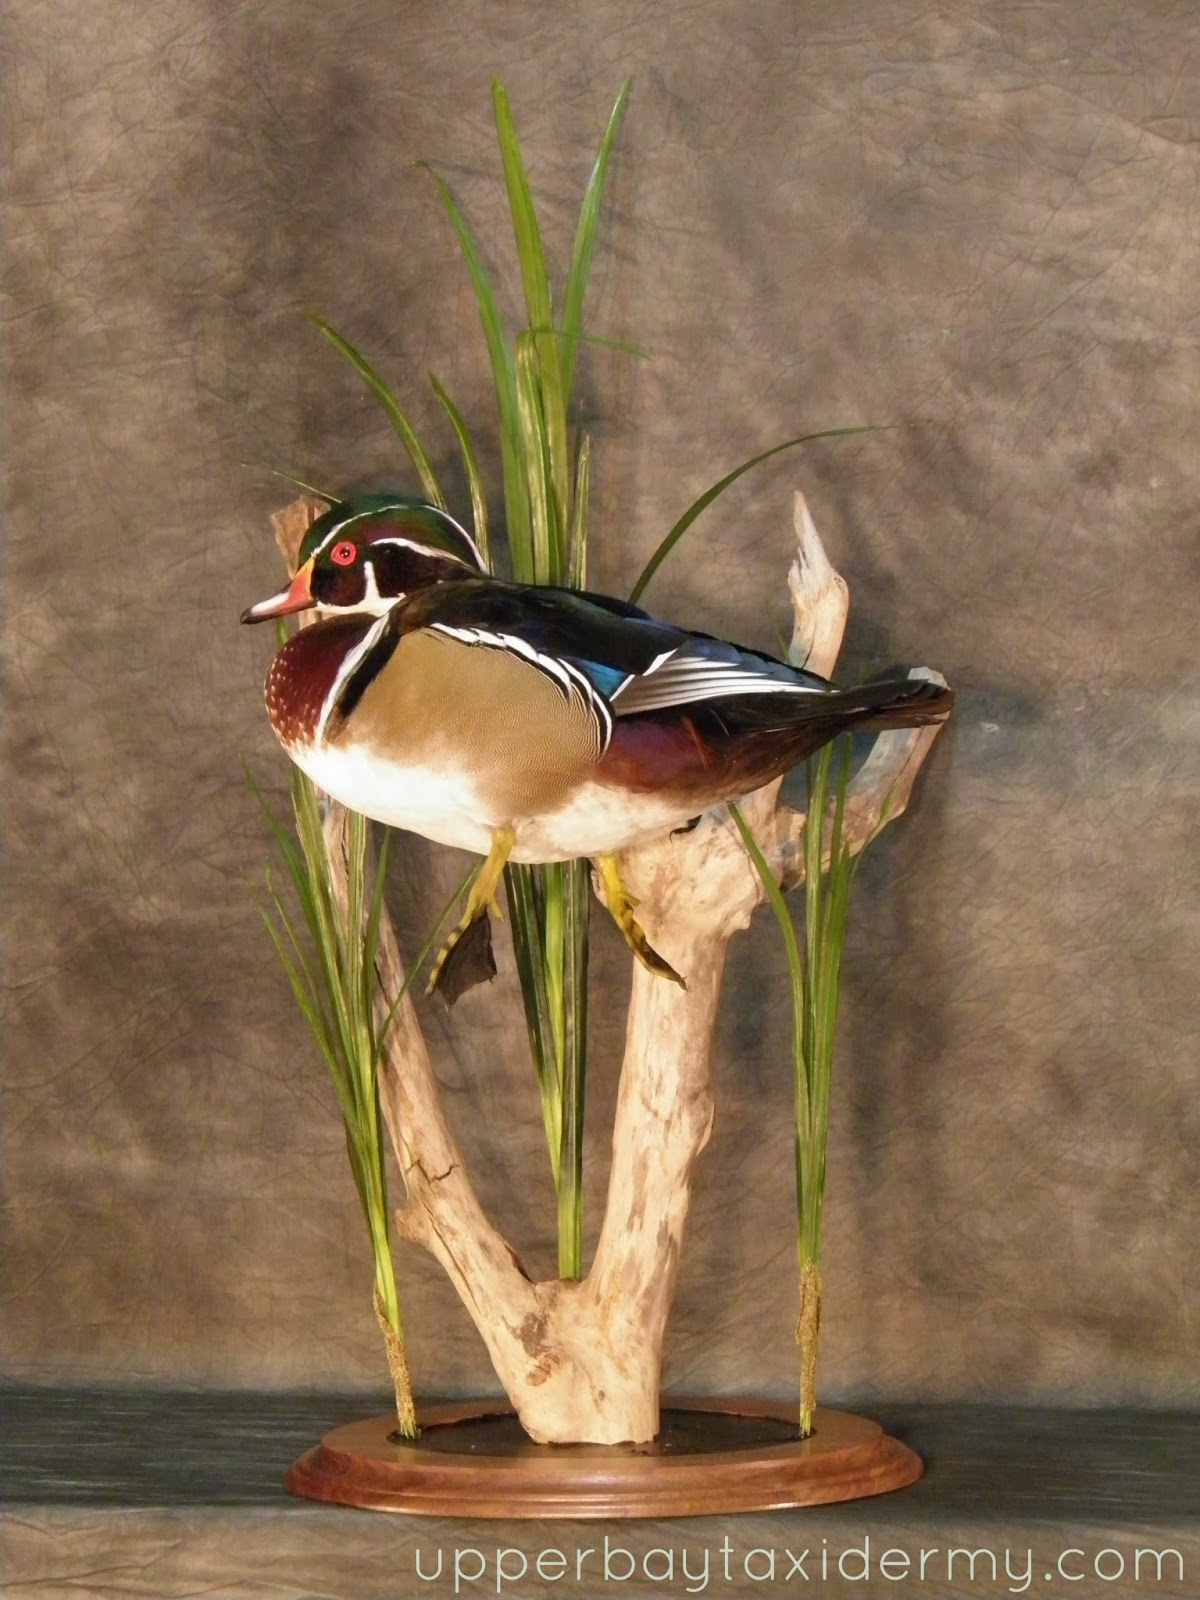 Upper Bay Taxidermy Mobile Gallery: Ducks